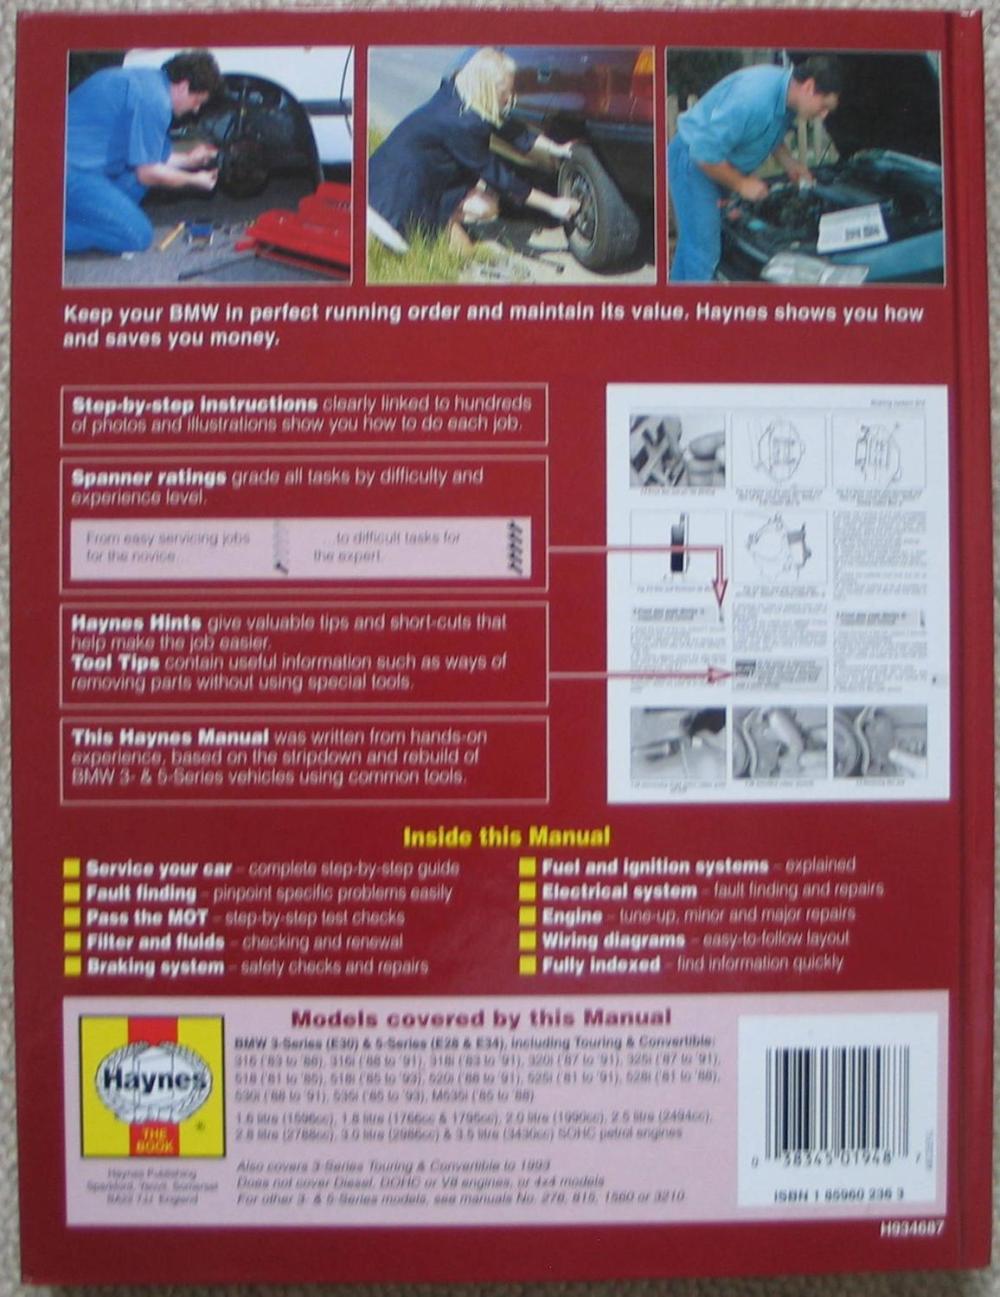 medium resolution of  bmw 3 5 series service and repair manual legg a k